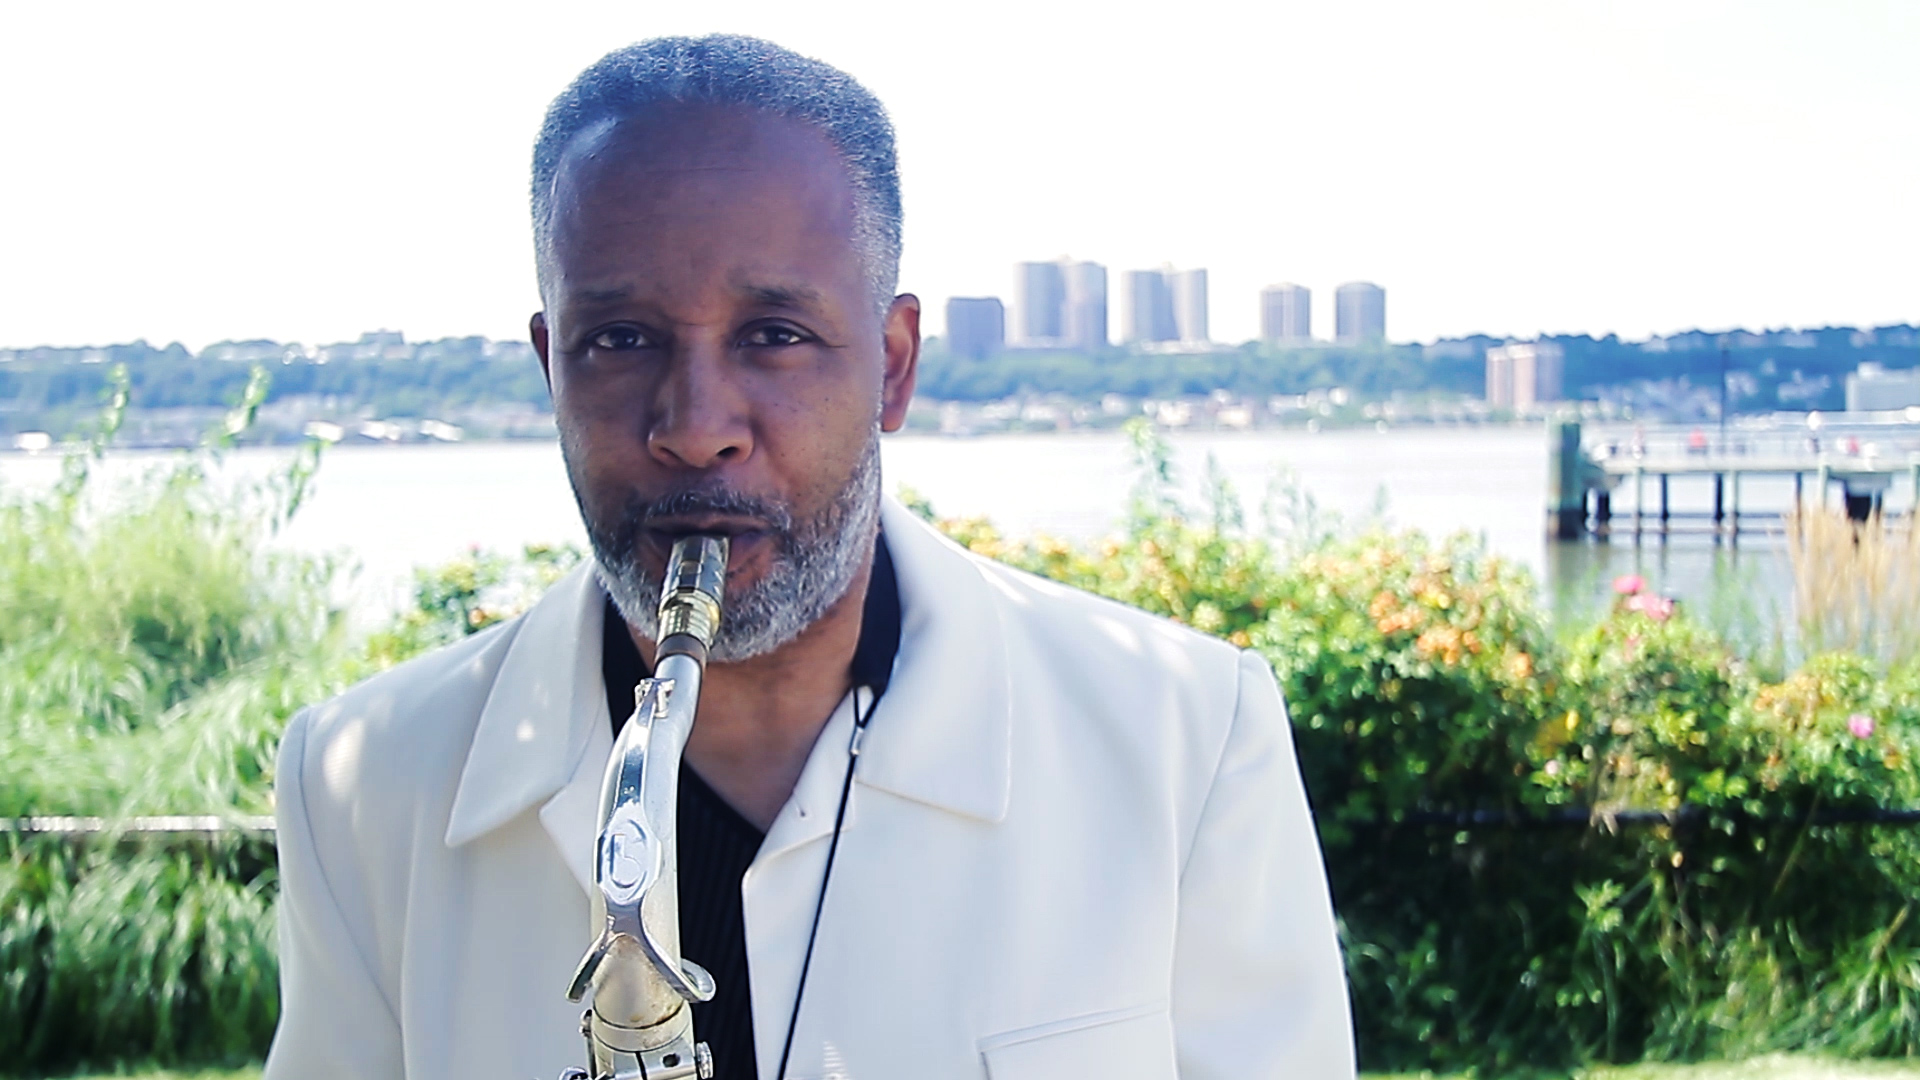 Reverend Nat Dixon - Made In New York City - 01 - Reverend Nat Dixon - Backstreet Blues.00_01_16_15.